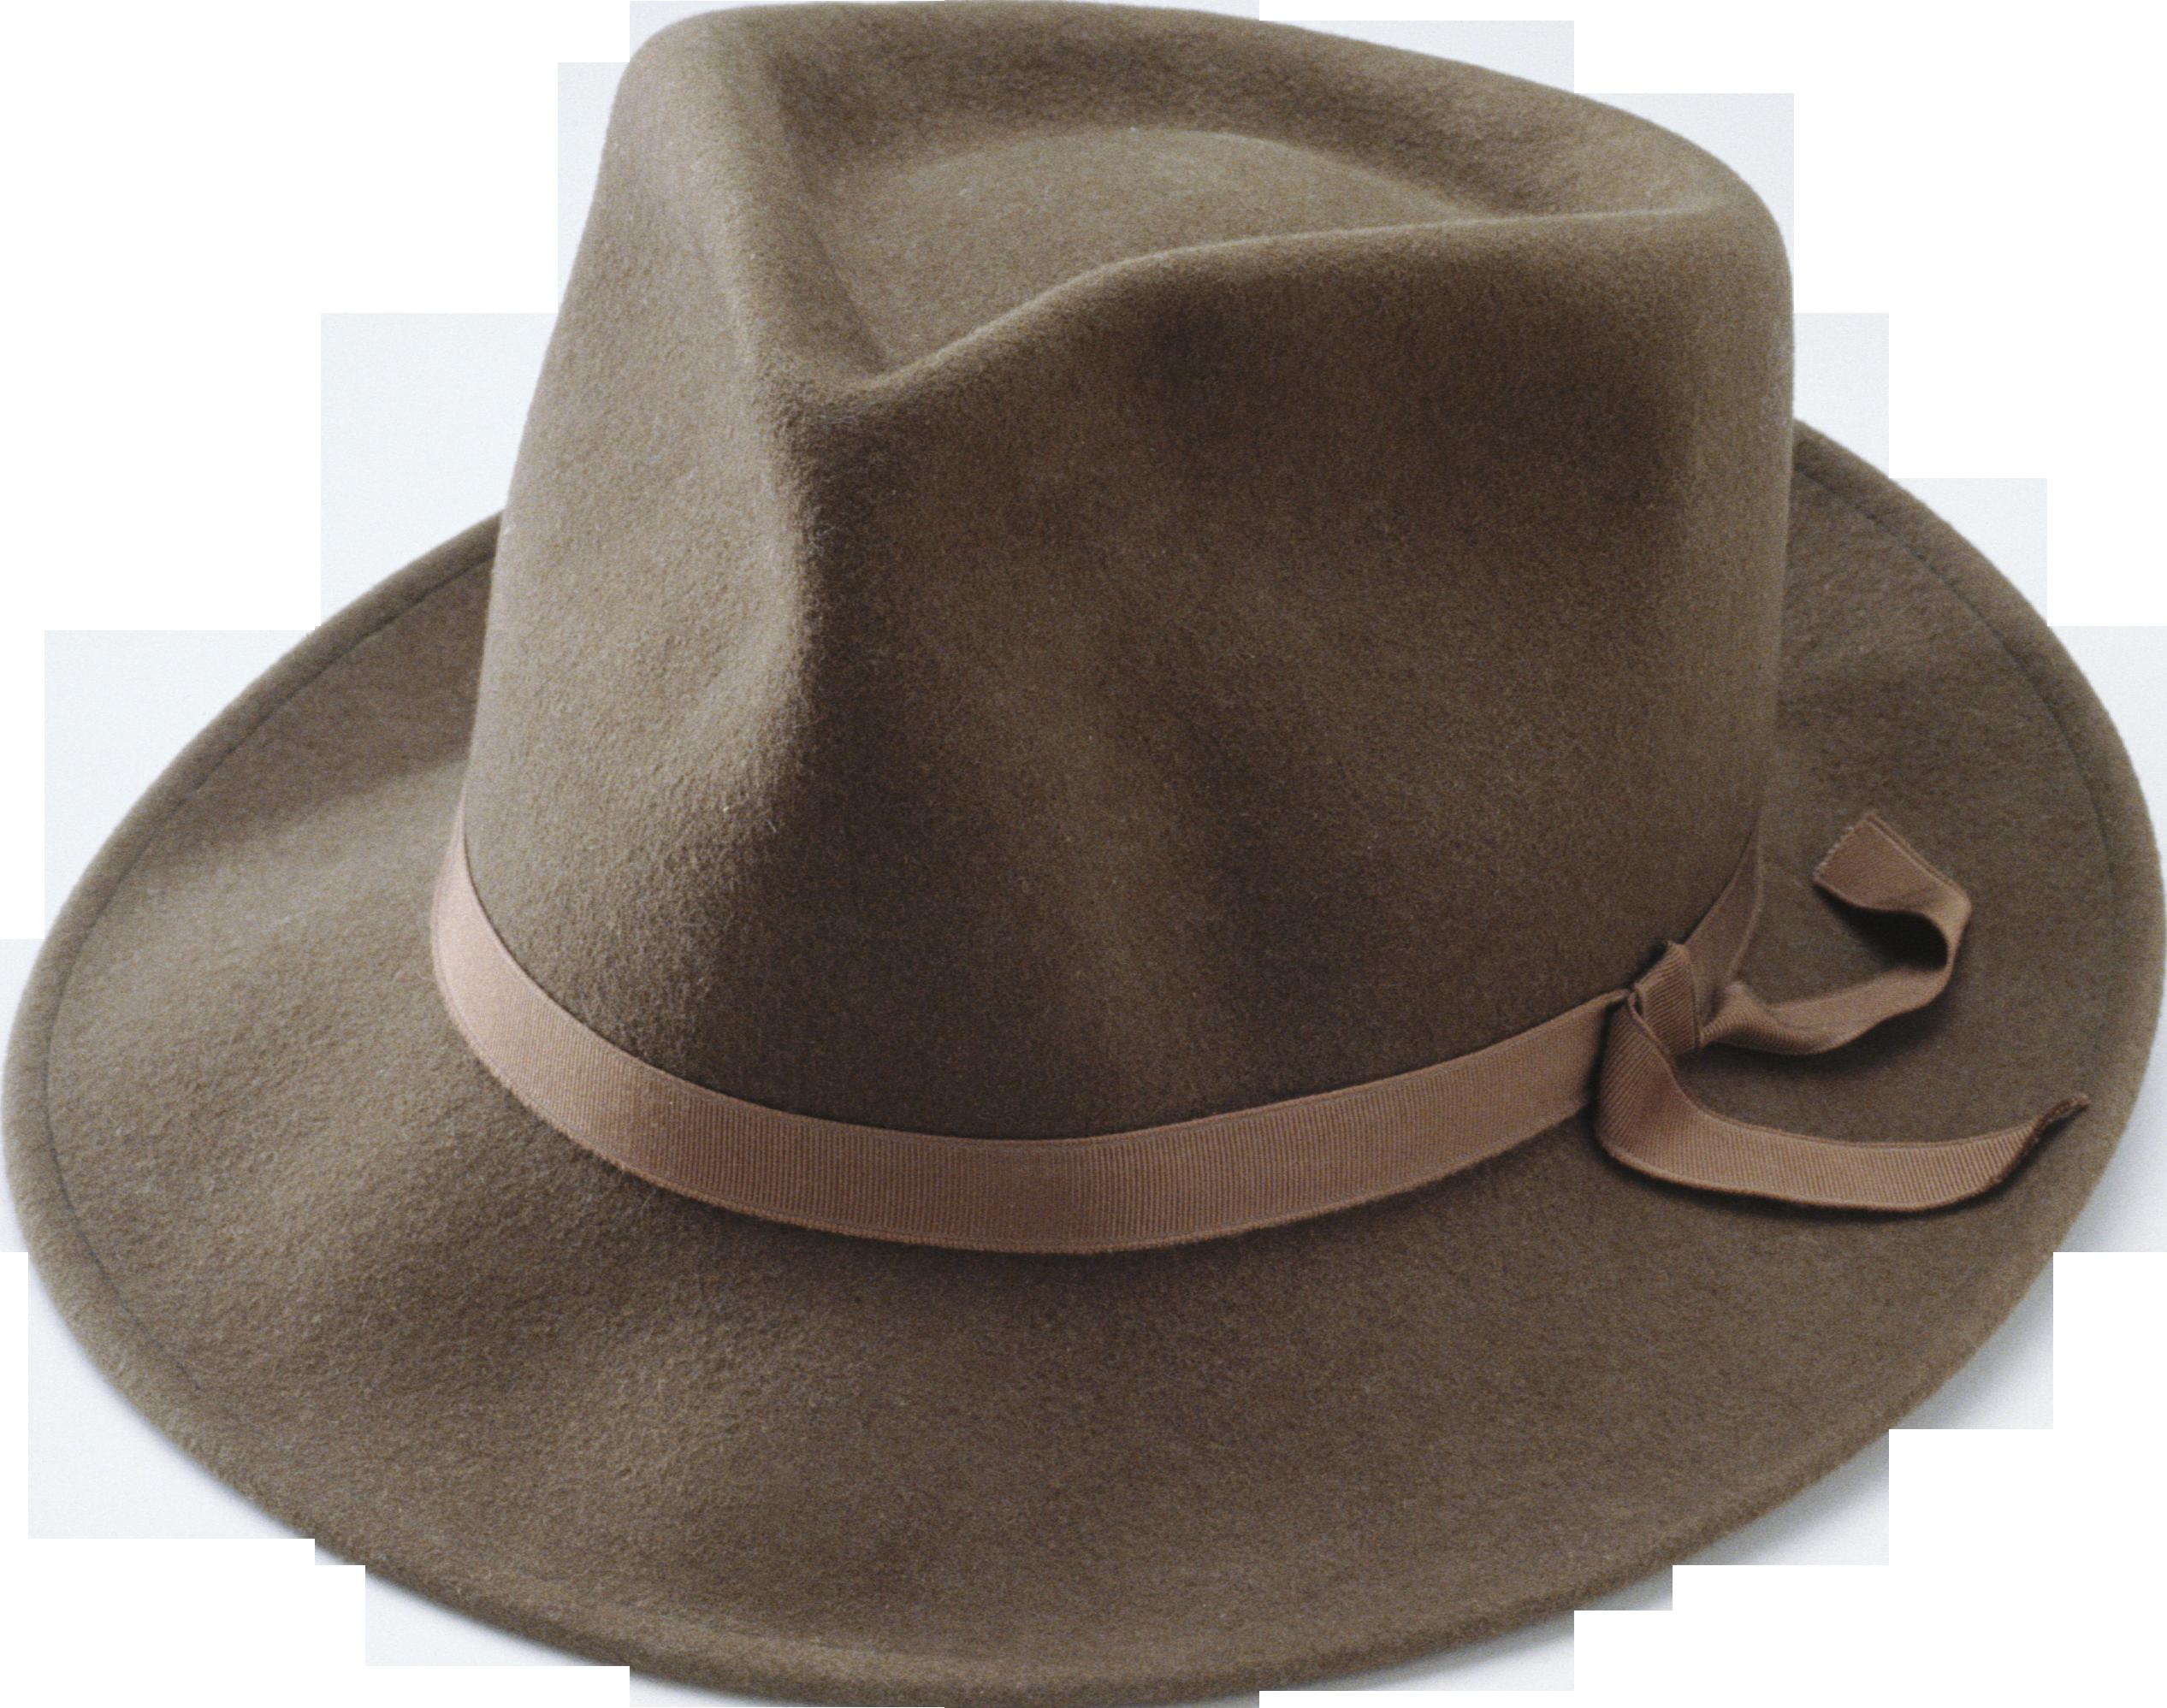 Hat Boy's PNG Image